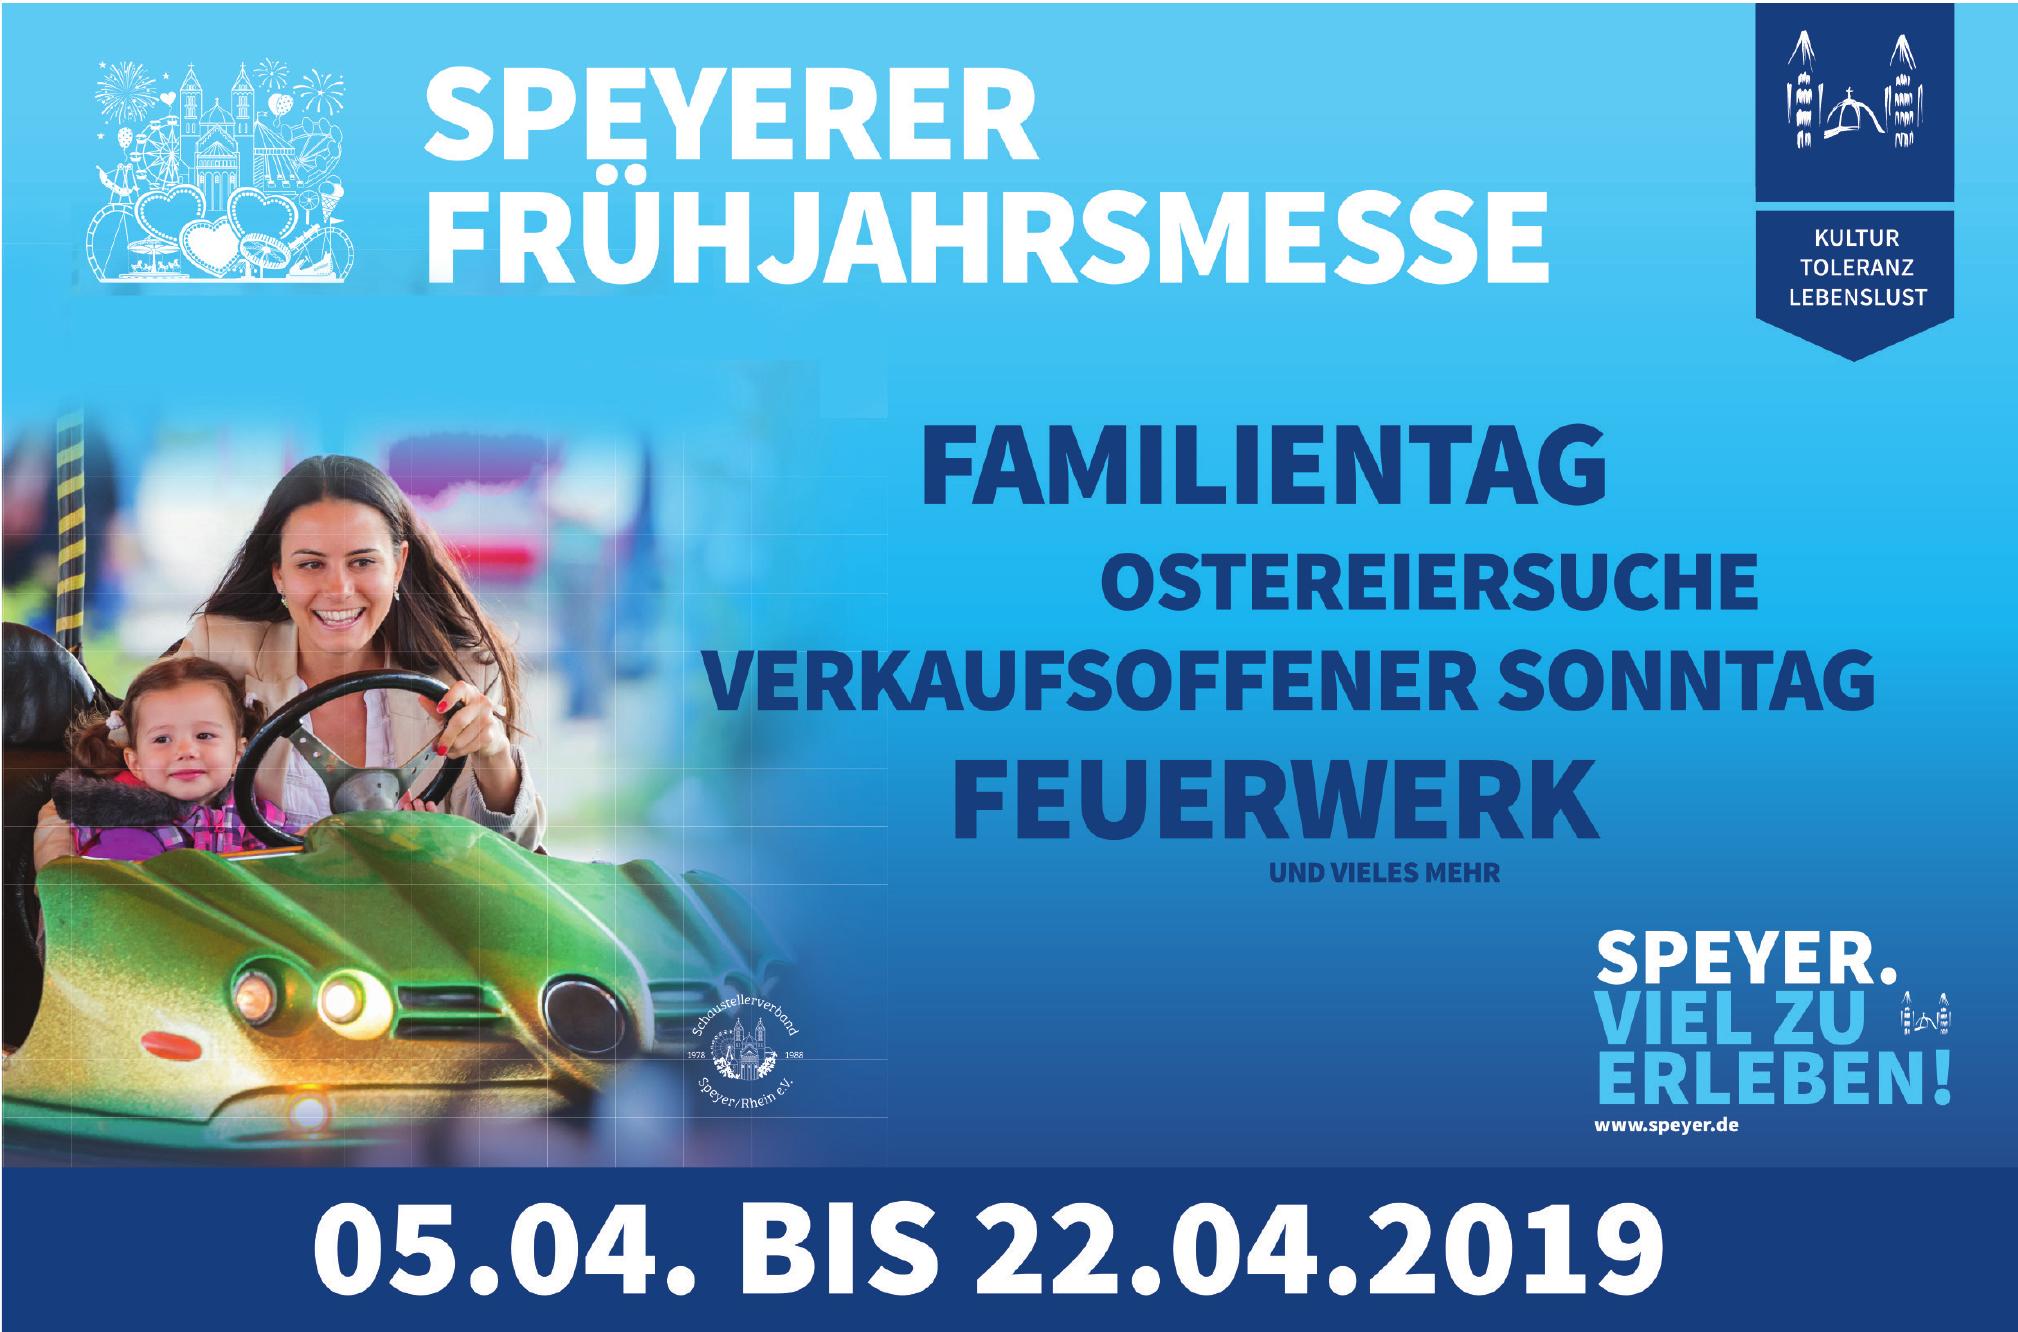 Speyerer Frühjahrsmesse